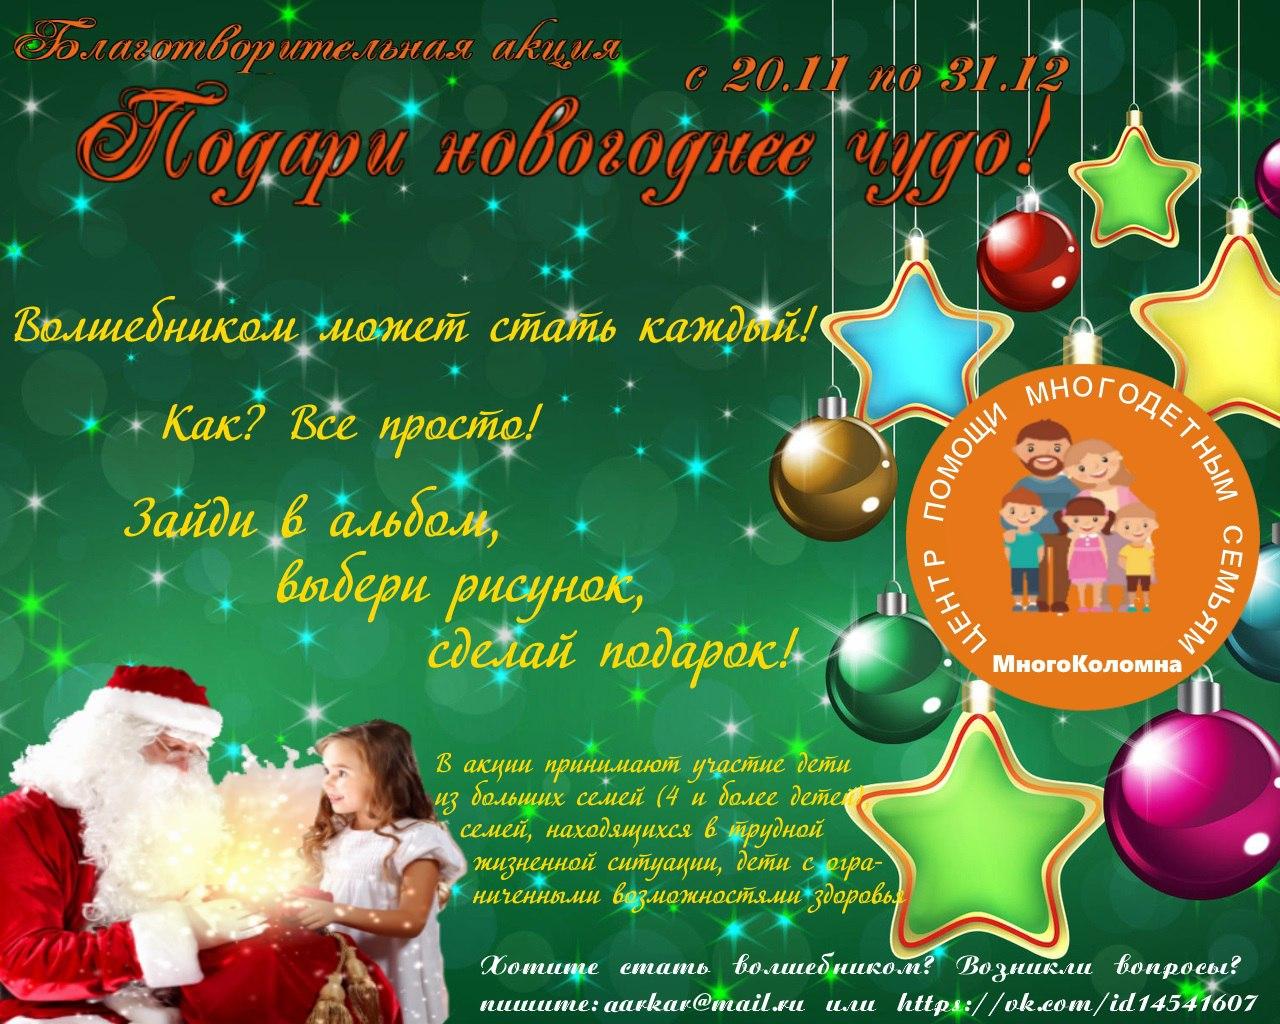 Афиша Коломна Подари новогоднее чудо!